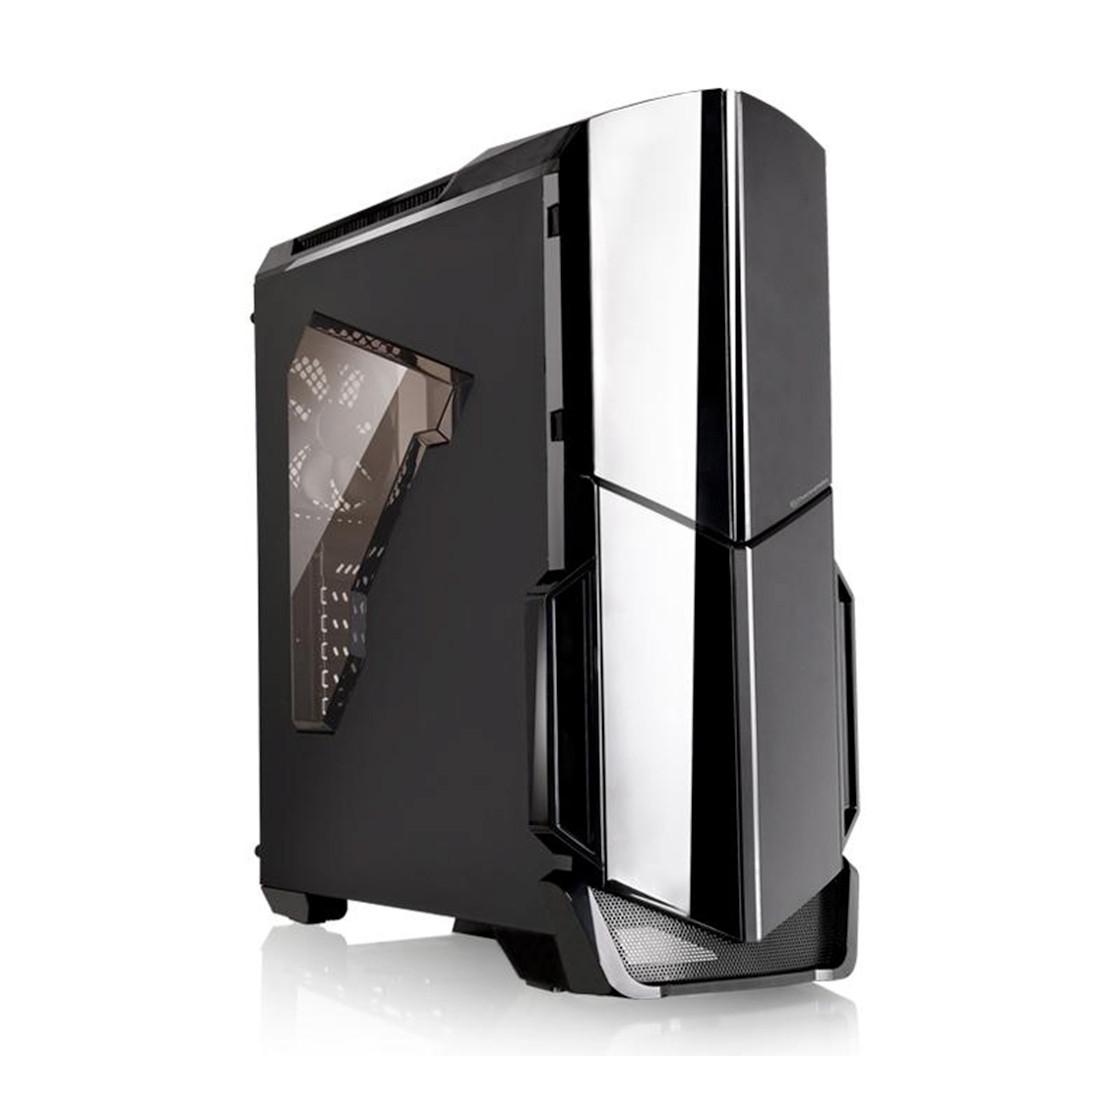 Компьютерный корпус Thermaltake Versa N21